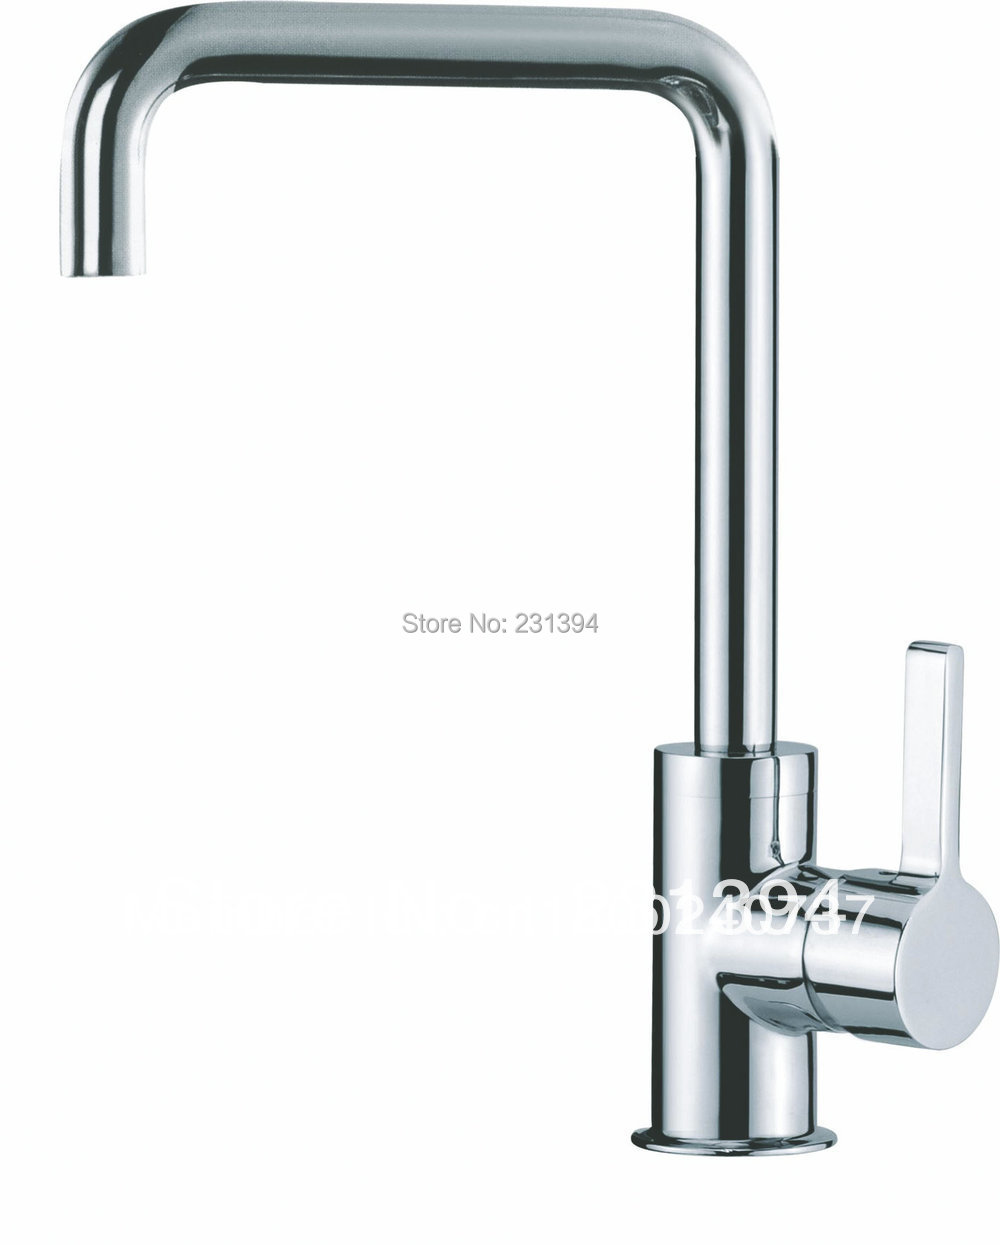 MS 3502 Soild Brass Chrome Finish Single Handle Price font b Pfister b font Water Tap